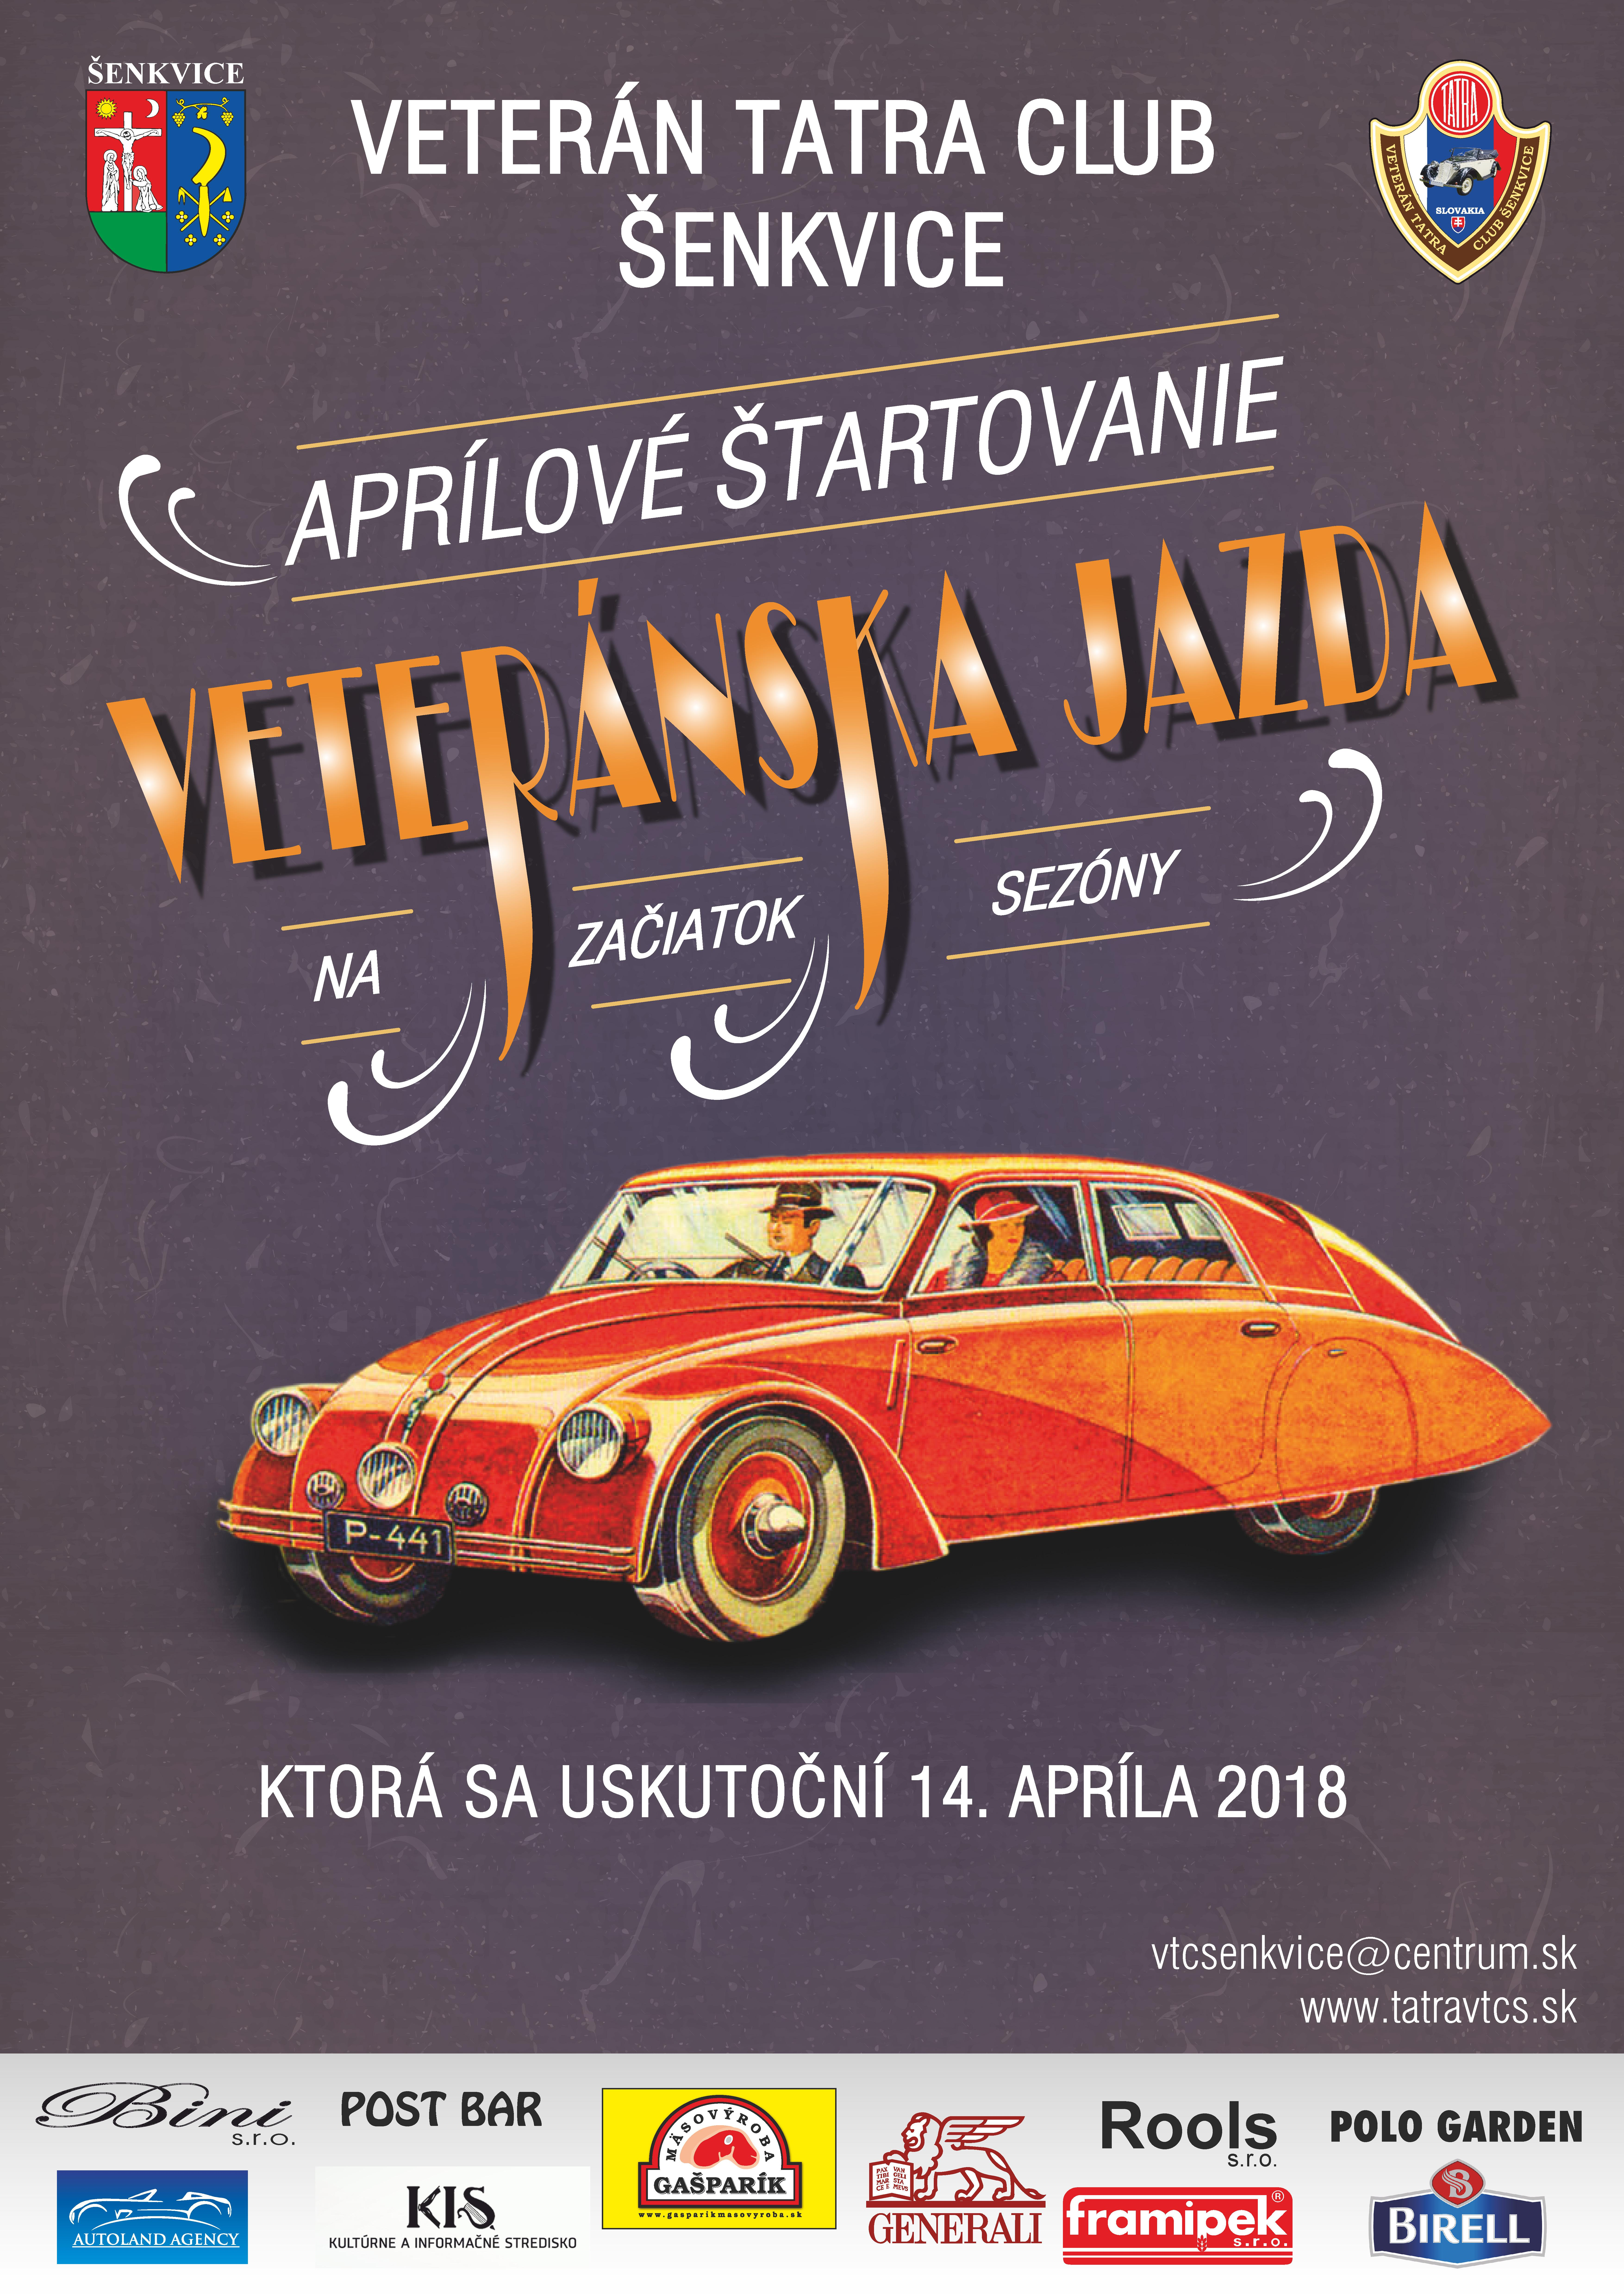 Aprilove_Startovanie_2018